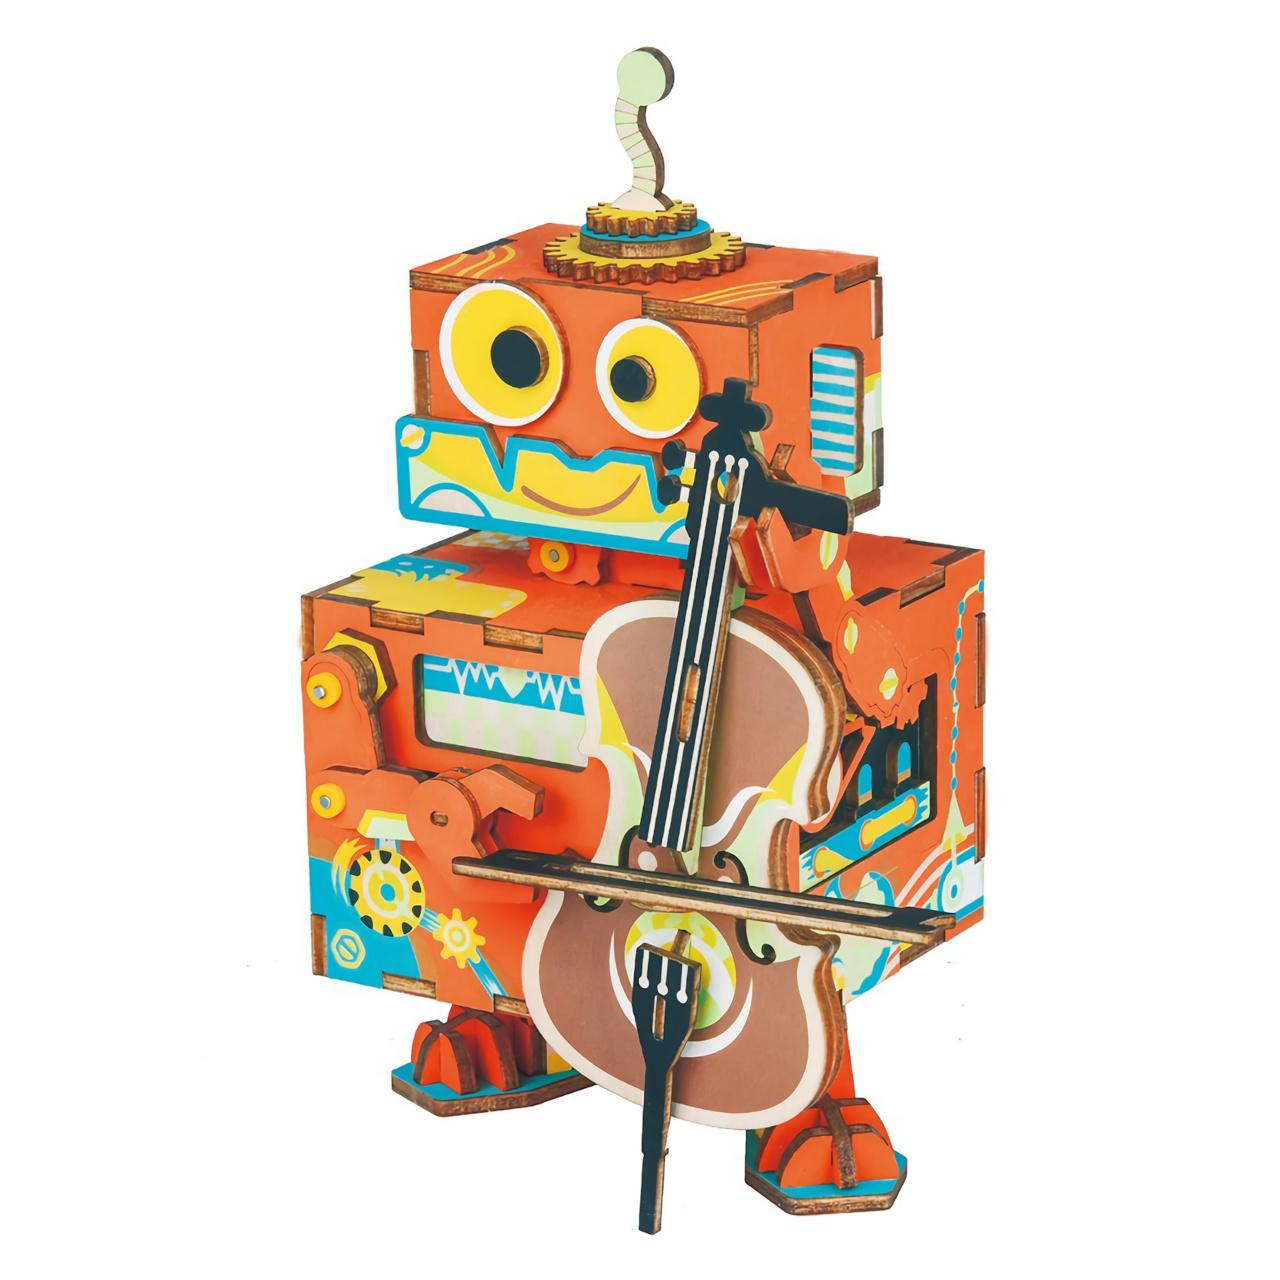 RoboTime 3D skládačka hrací skříňky Muzikální robůtek